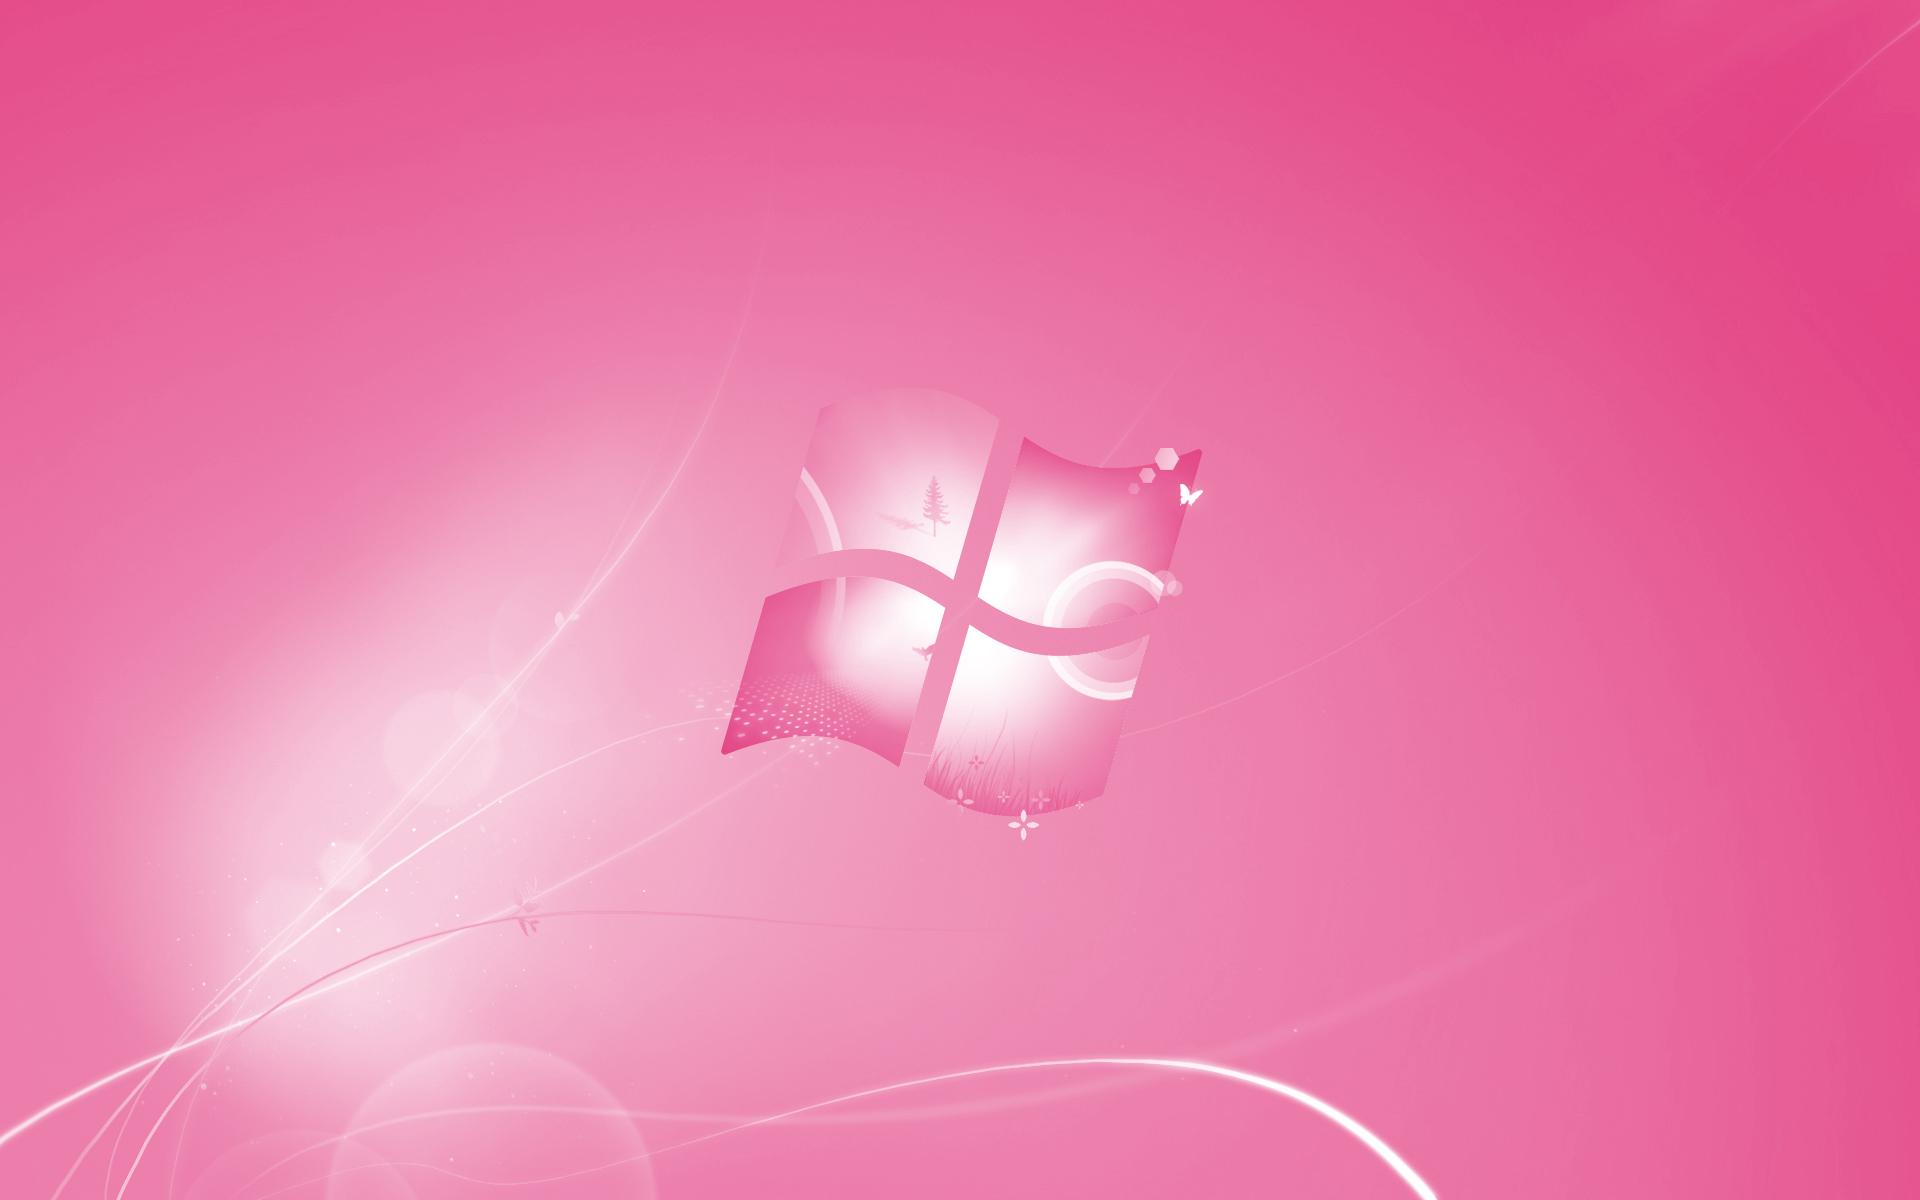 hp wallpaper pink - photo #1